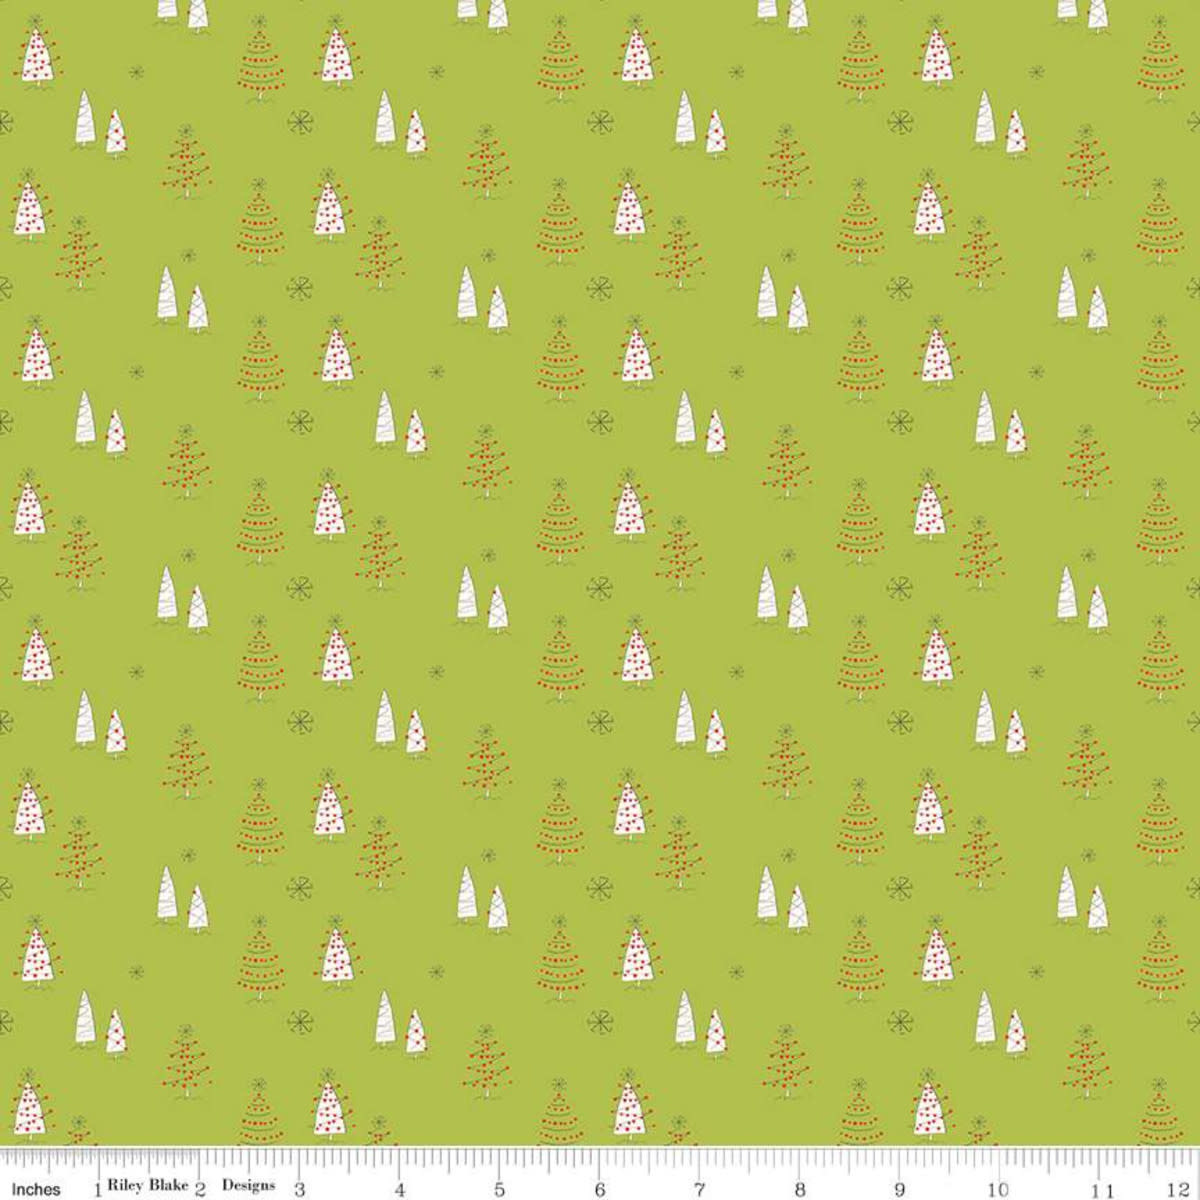 RILEY BLAKE DESIGNS MERRY LITTLE CHRISTMAS, TREES, GREEN $0.20 /CM OR $20/M